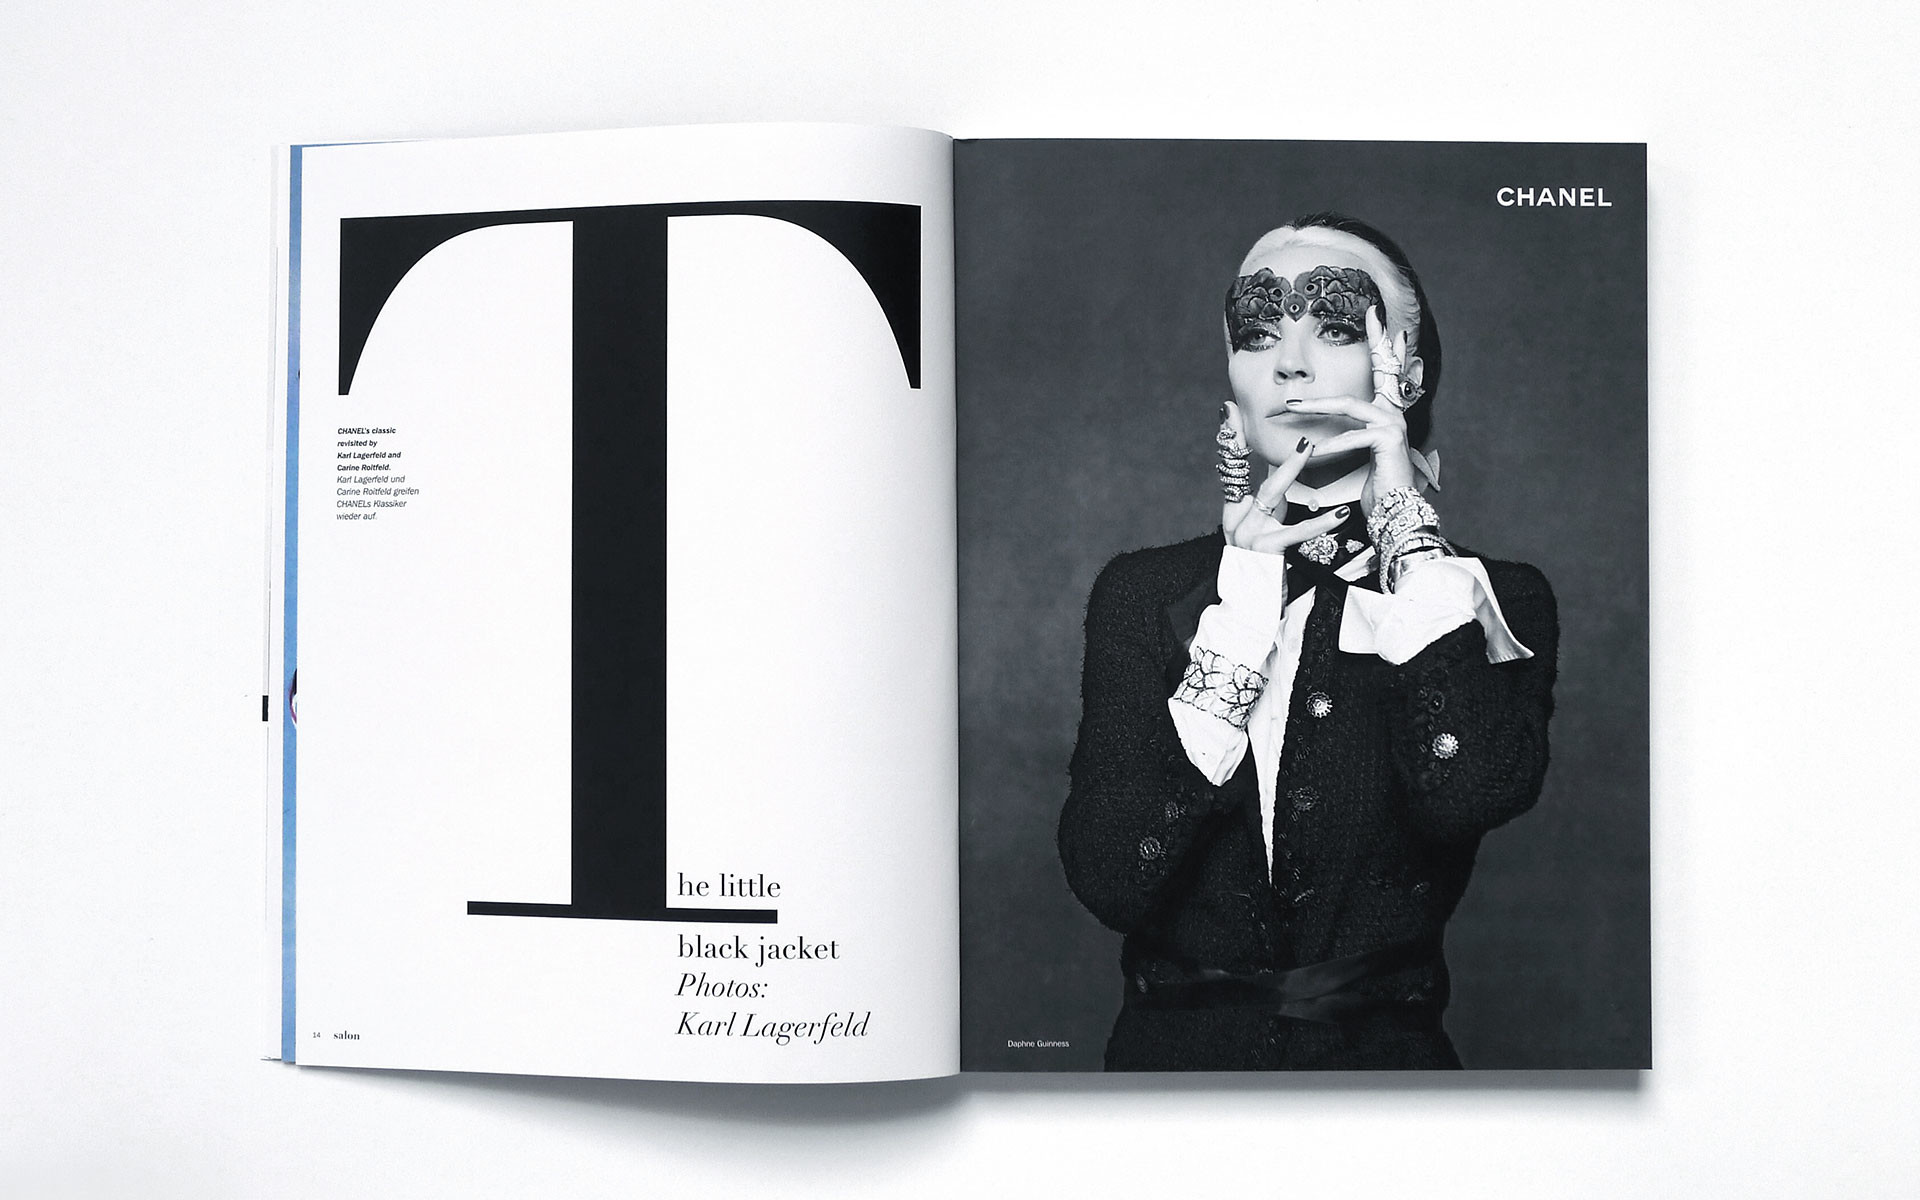 Salon 2012 – Cover story